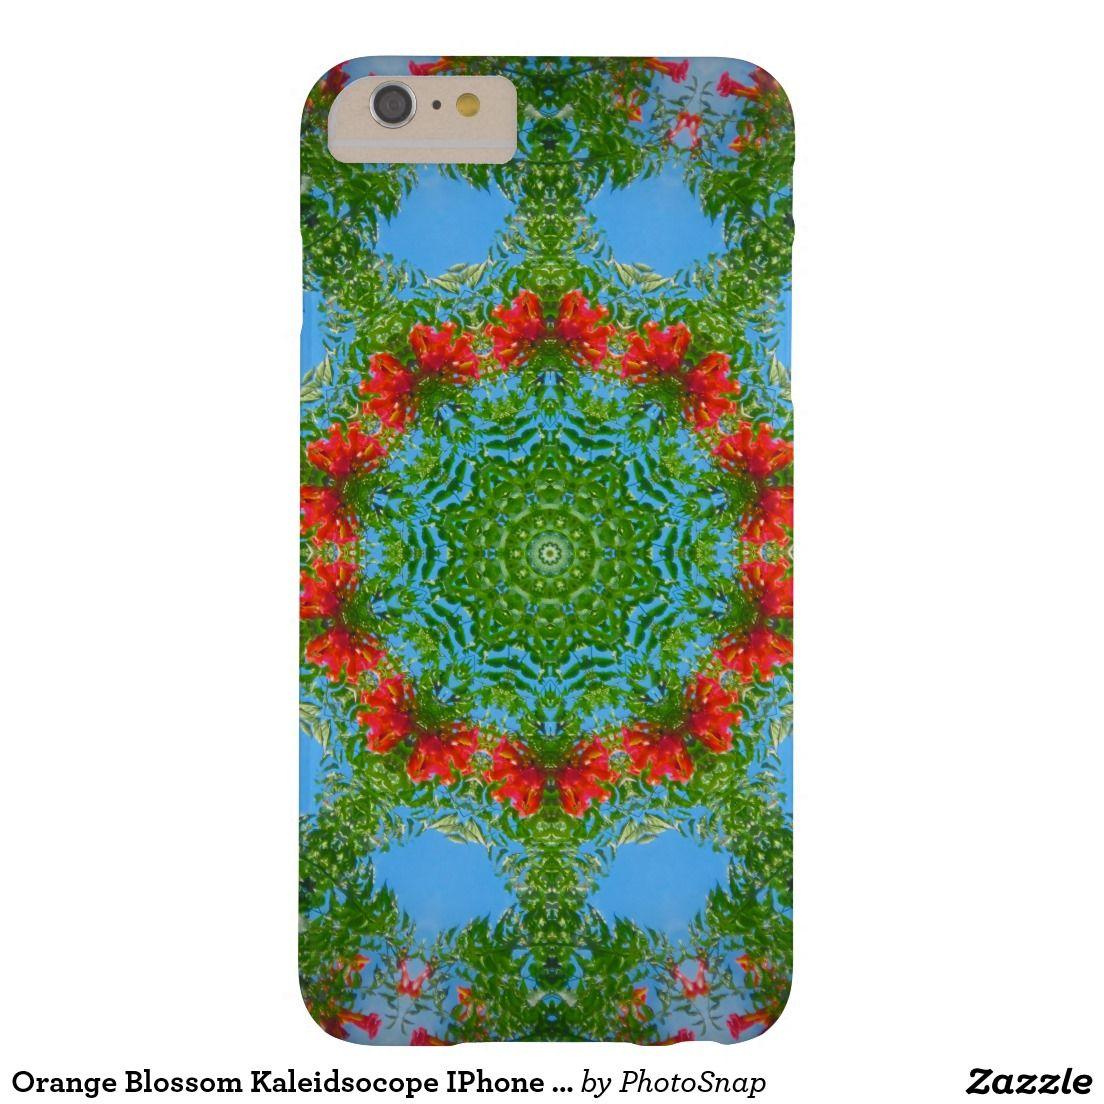 Orange Blossom Kaleidsocope IPhone 6 Plus Case